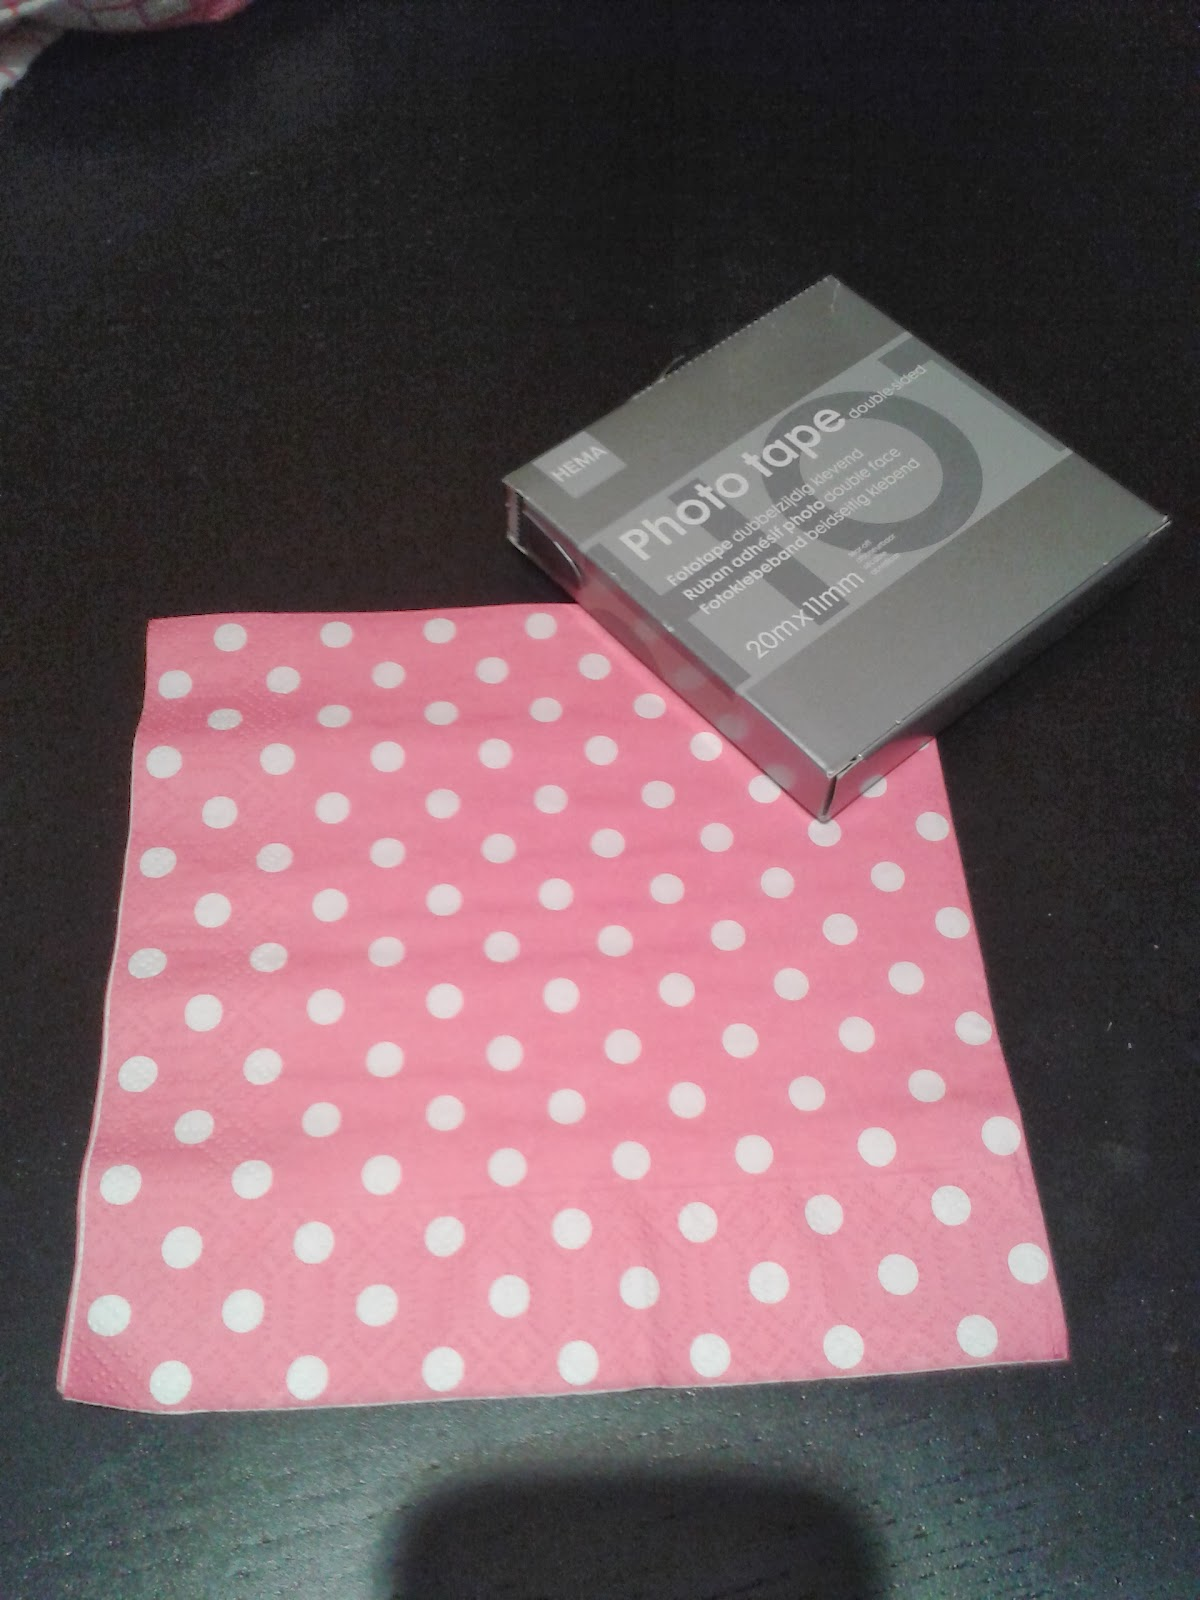 75bba 20140111 174628 - DIY | Washi tape (tutorial)